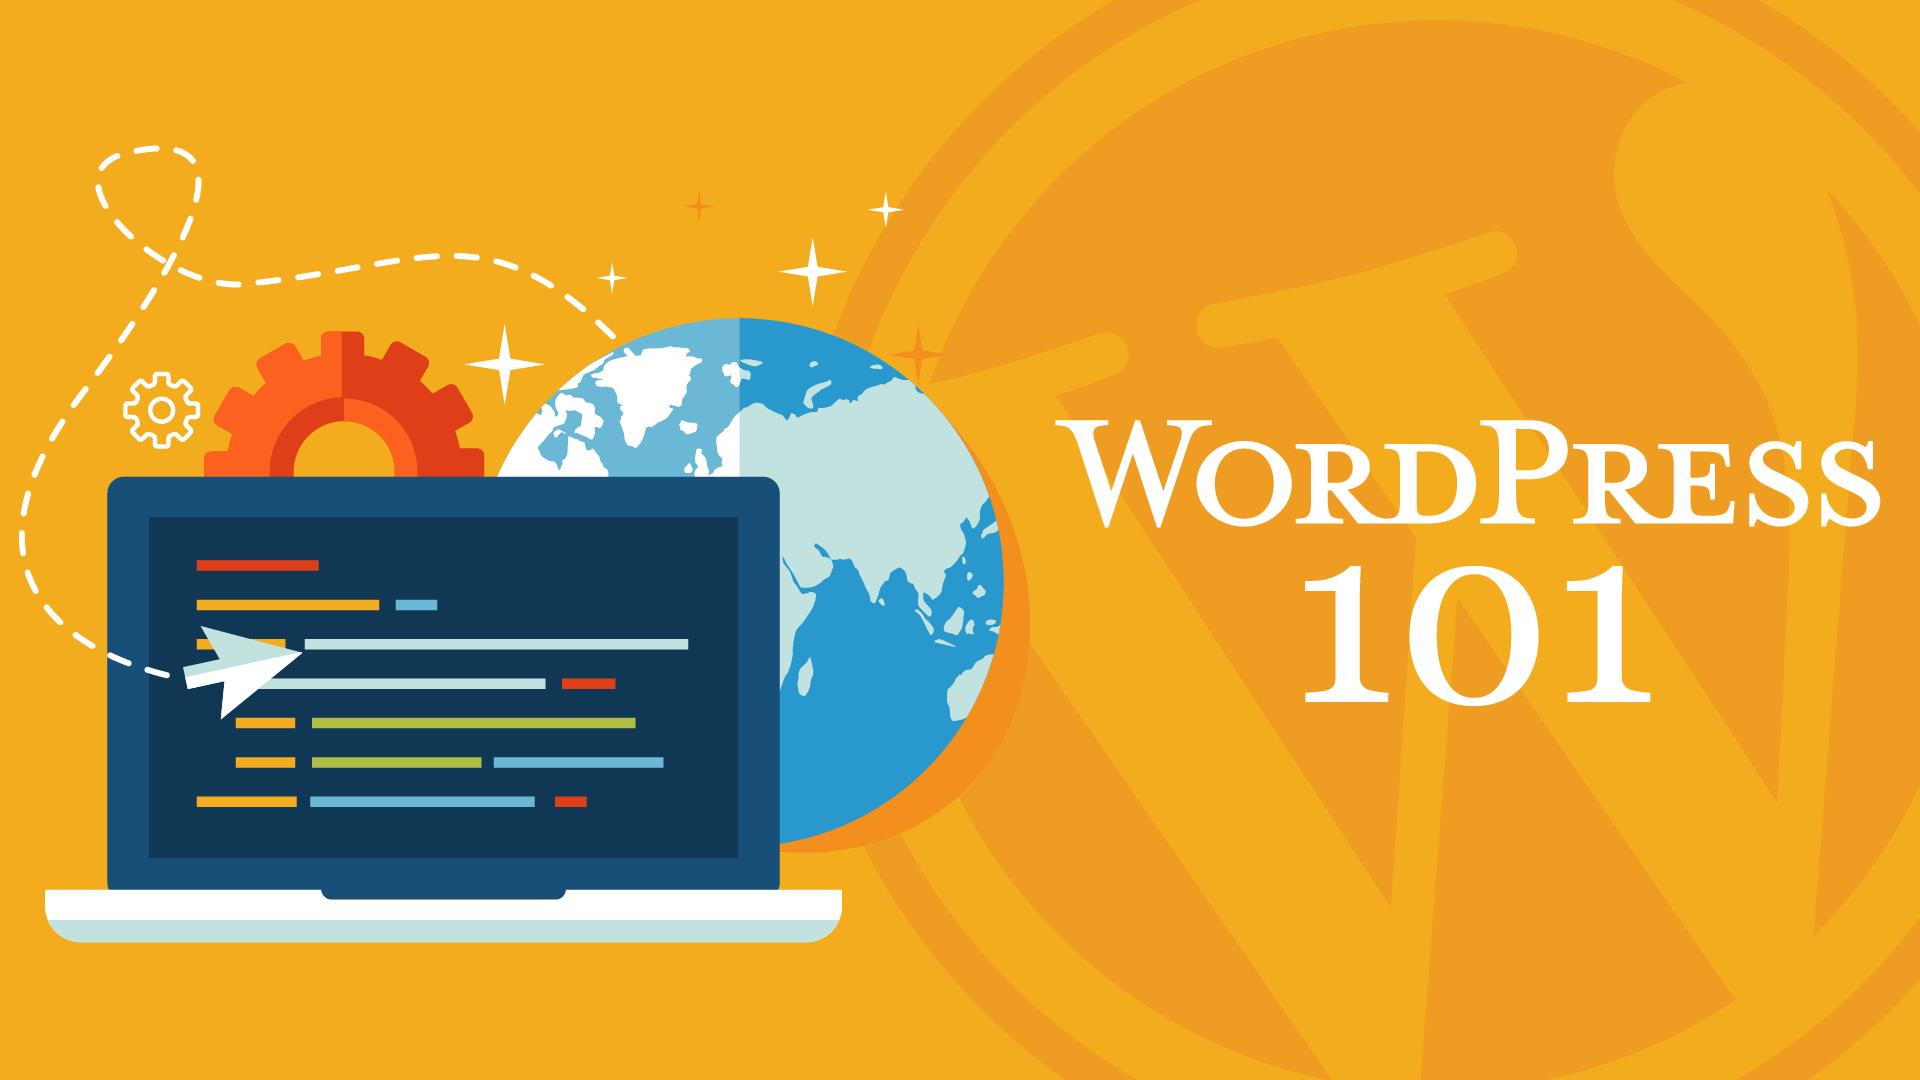 WordPress-101-Facebook-Header